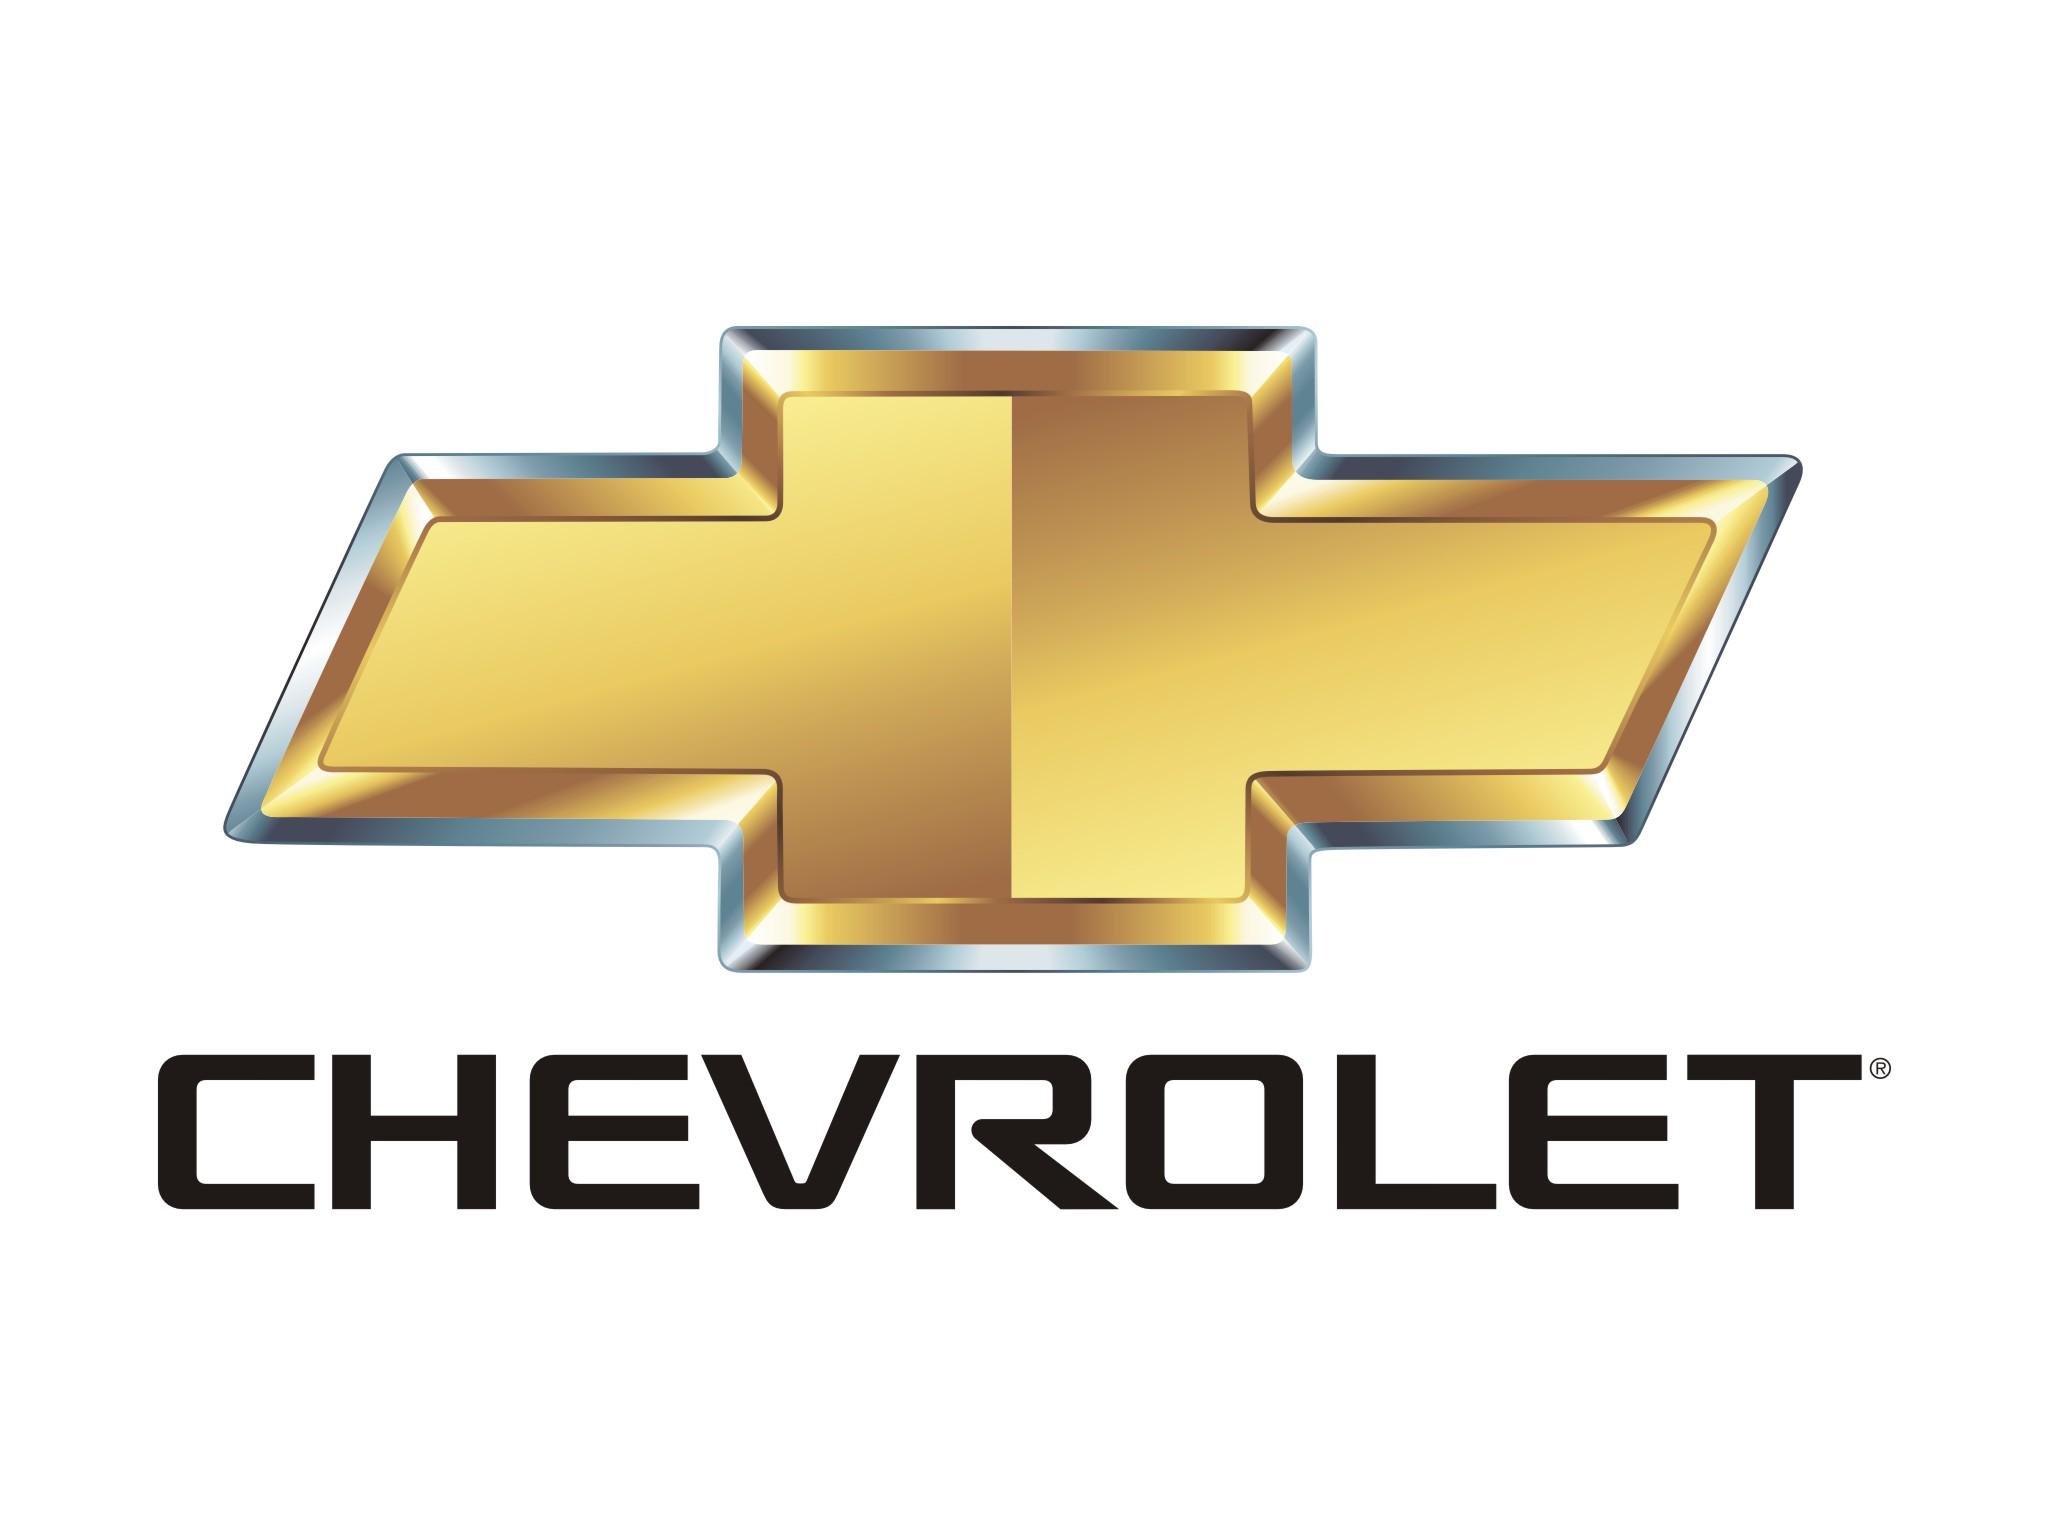 chevrolet logo hd wallpaper chevrolet logo hd wallpaper gallery 2048x1536